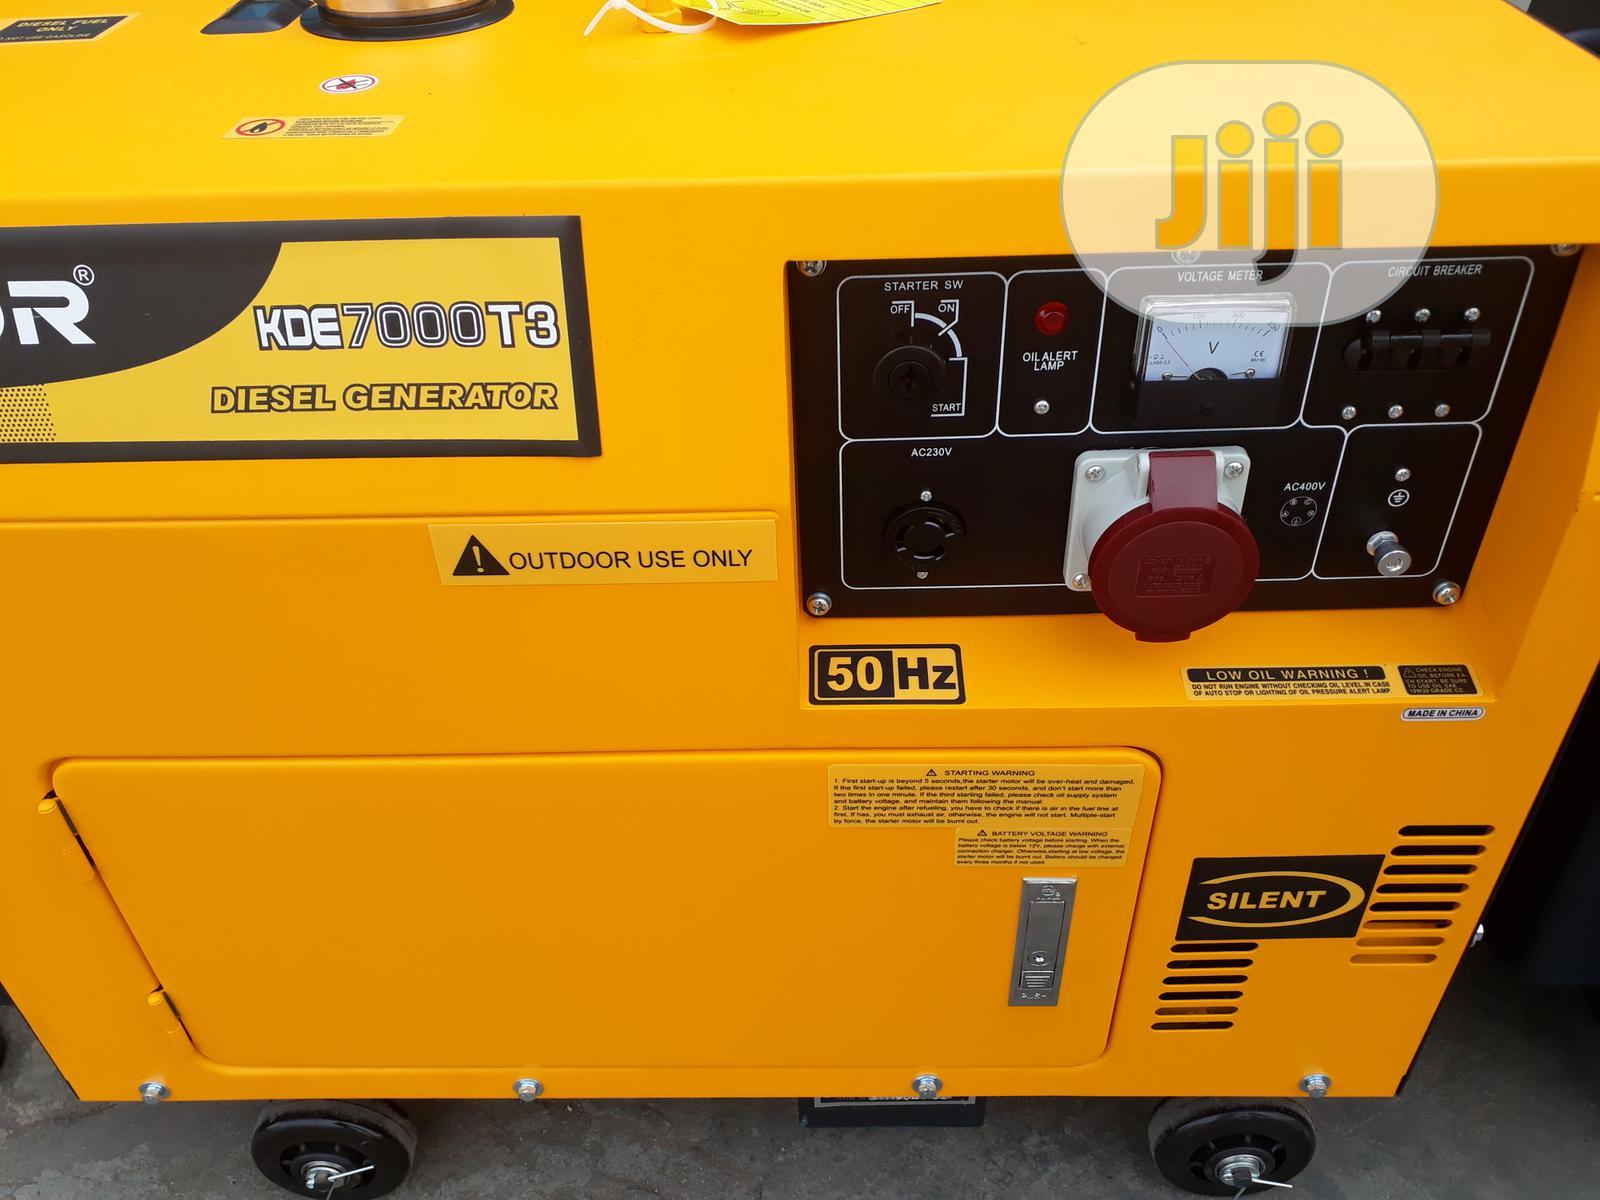 Kipor Diesel Generator 8.5kva Three Phase | Electrical Equipment for sale in Yaba, Lagos State, Nigeria